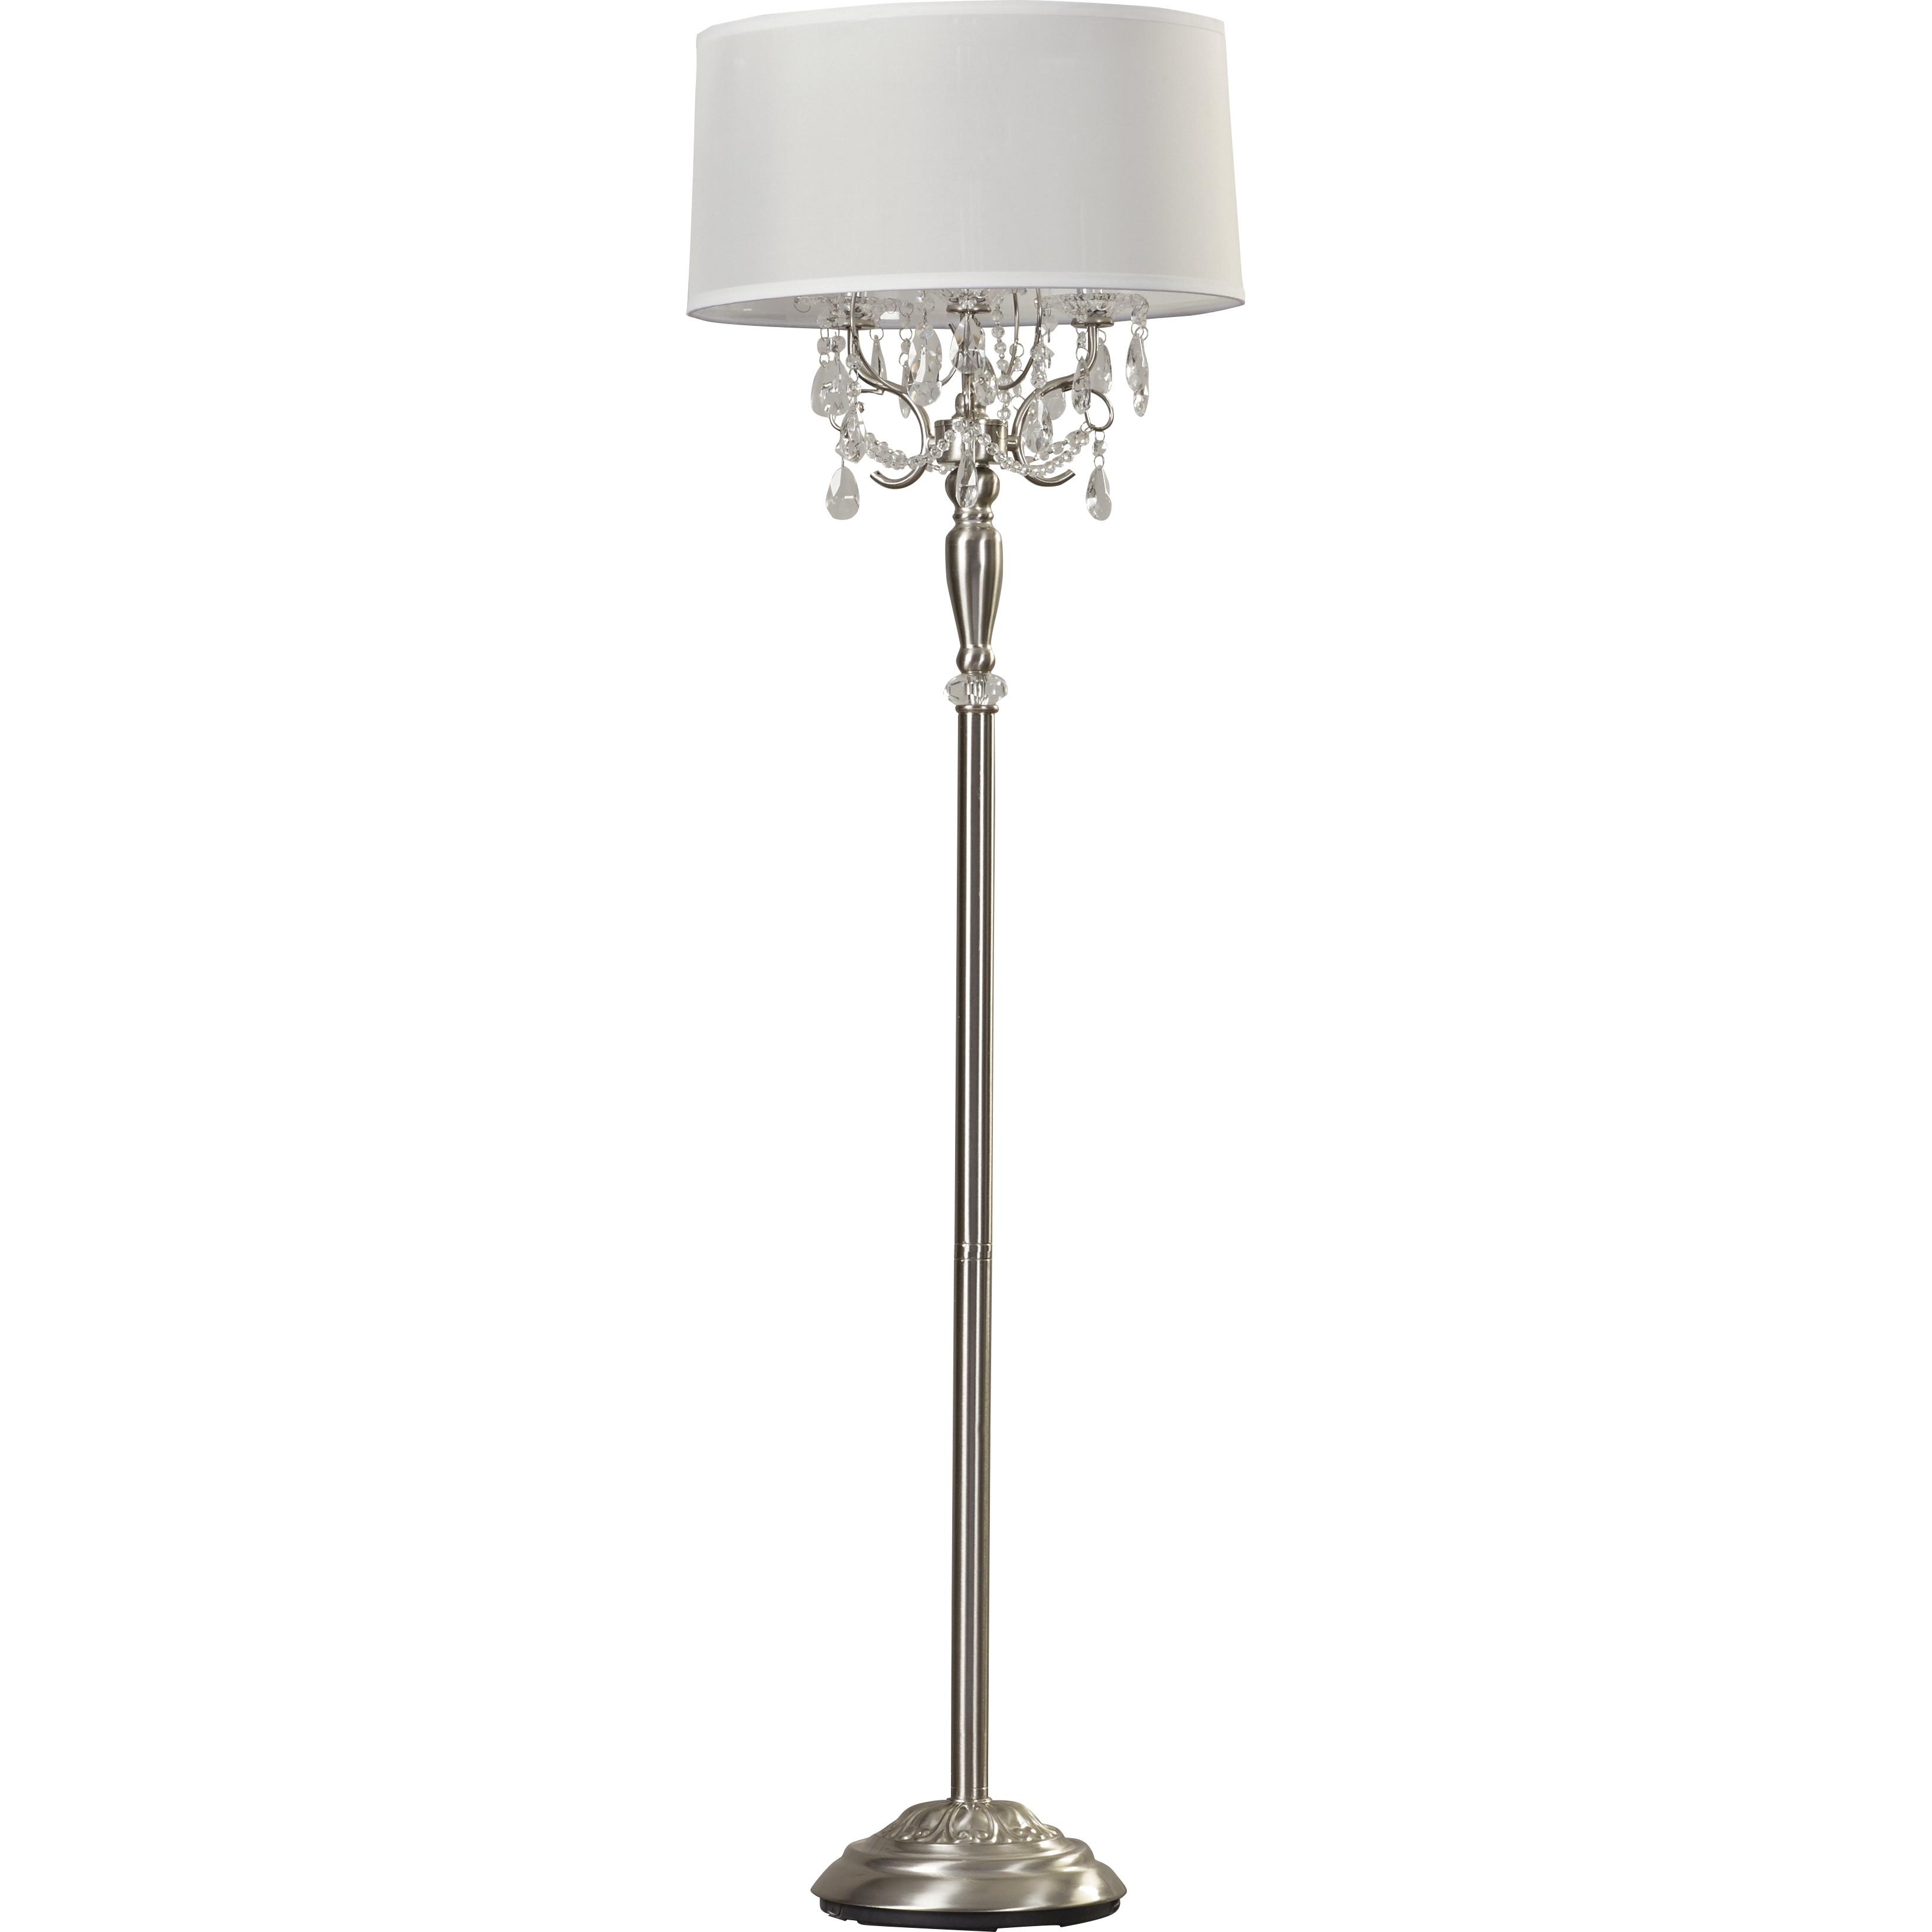 Lights Crystal Floor Lamp Luxury Floor Lamp Stacked Crystal With Regard To Chandelier Standing Lamps (View 19 of 25)